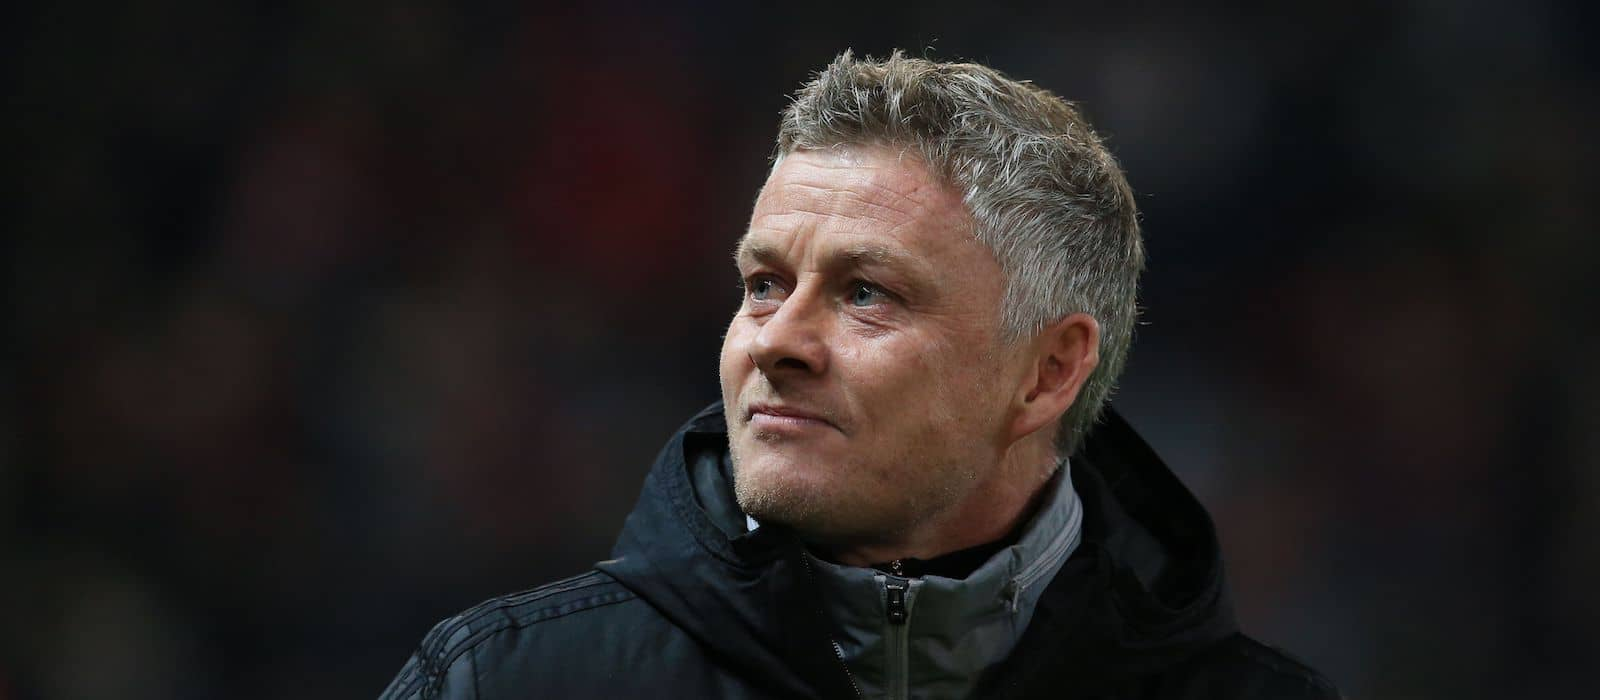 Ole Gunnar Solskjaer confirms desire for Manchester United signings